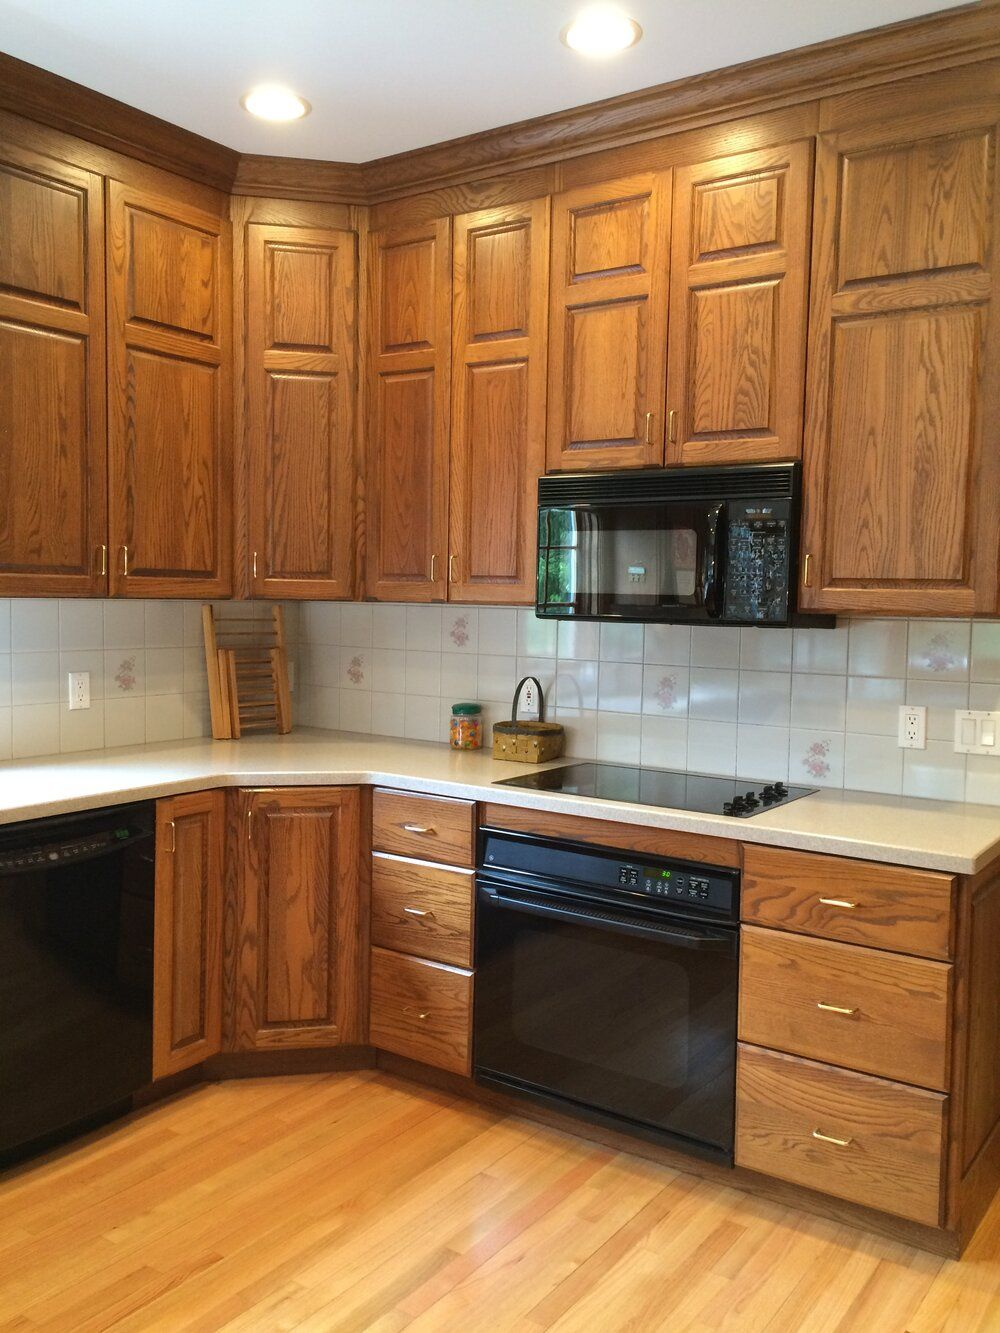 How To Make An Oak Kitchen Cool Again Copper Corners In 2020 Oak Kitchen Cabinets Oak Kitchen Modern Oak Kitchen